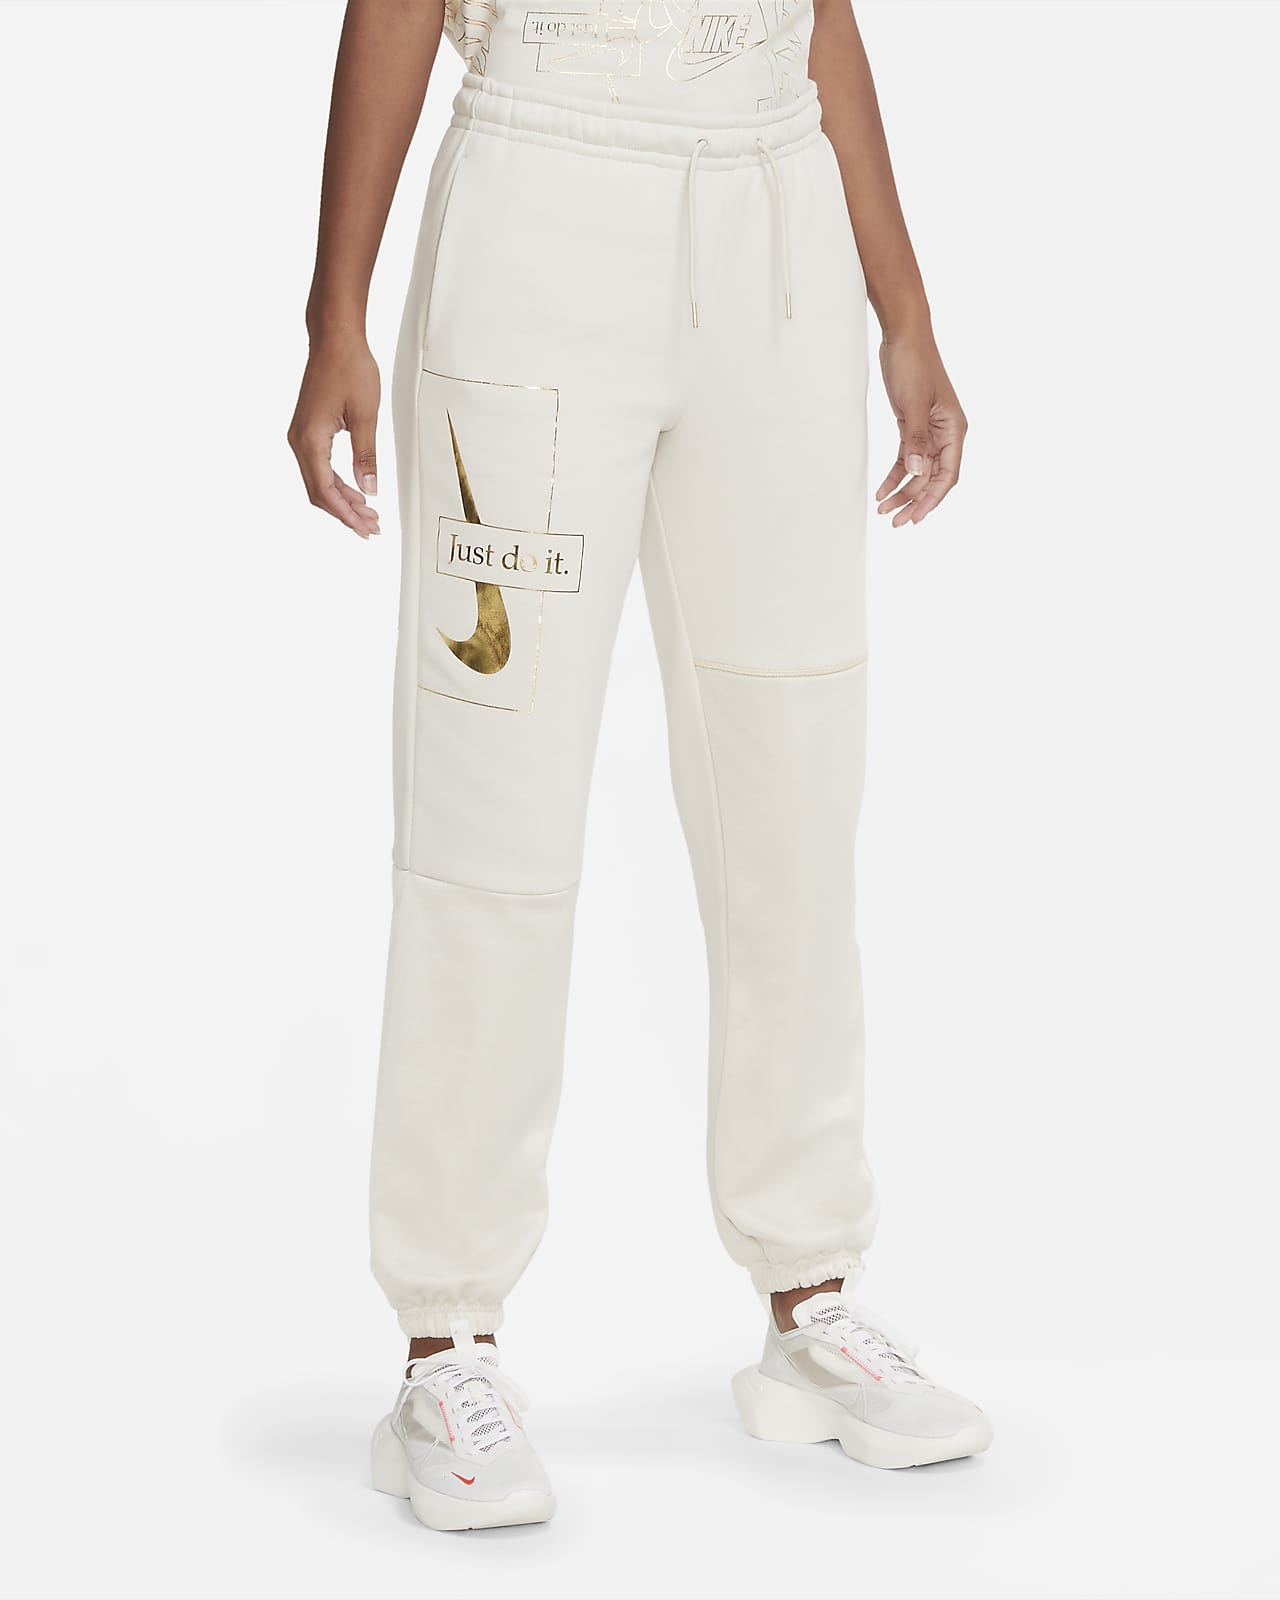 Nike Sportswear Icon Clash-bukser til kvinder